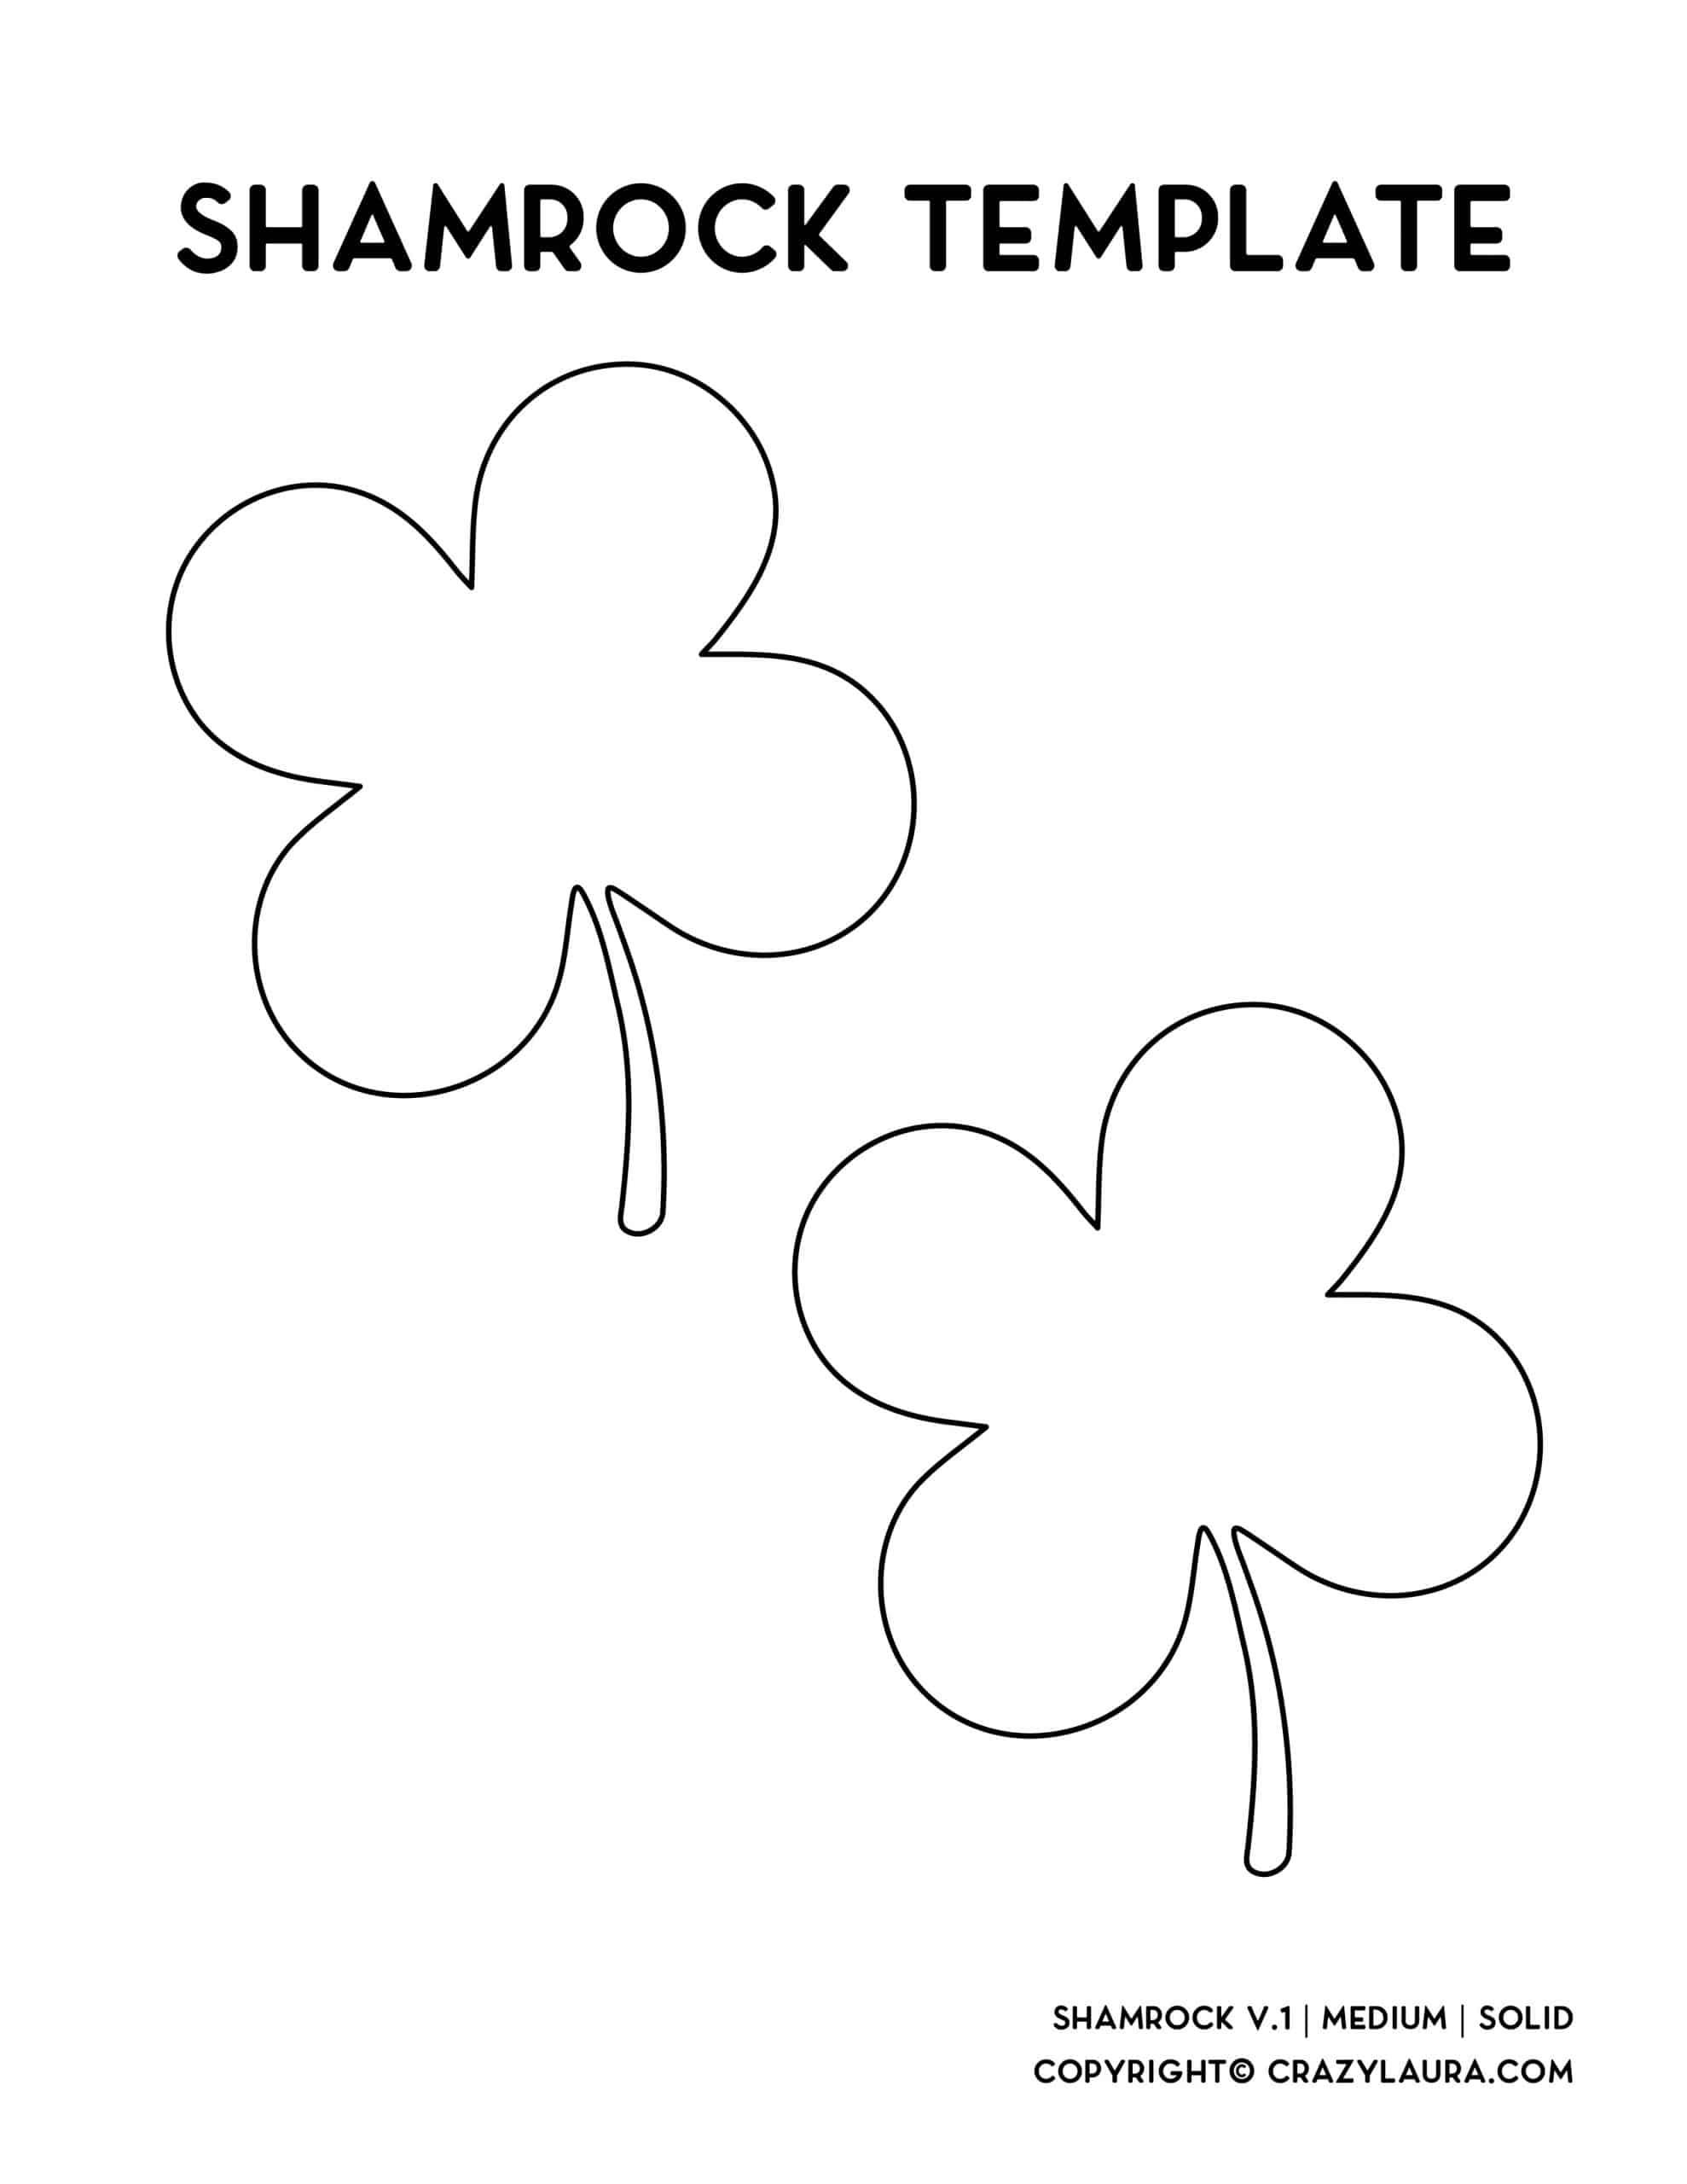 medium size four leaf clover print sheet